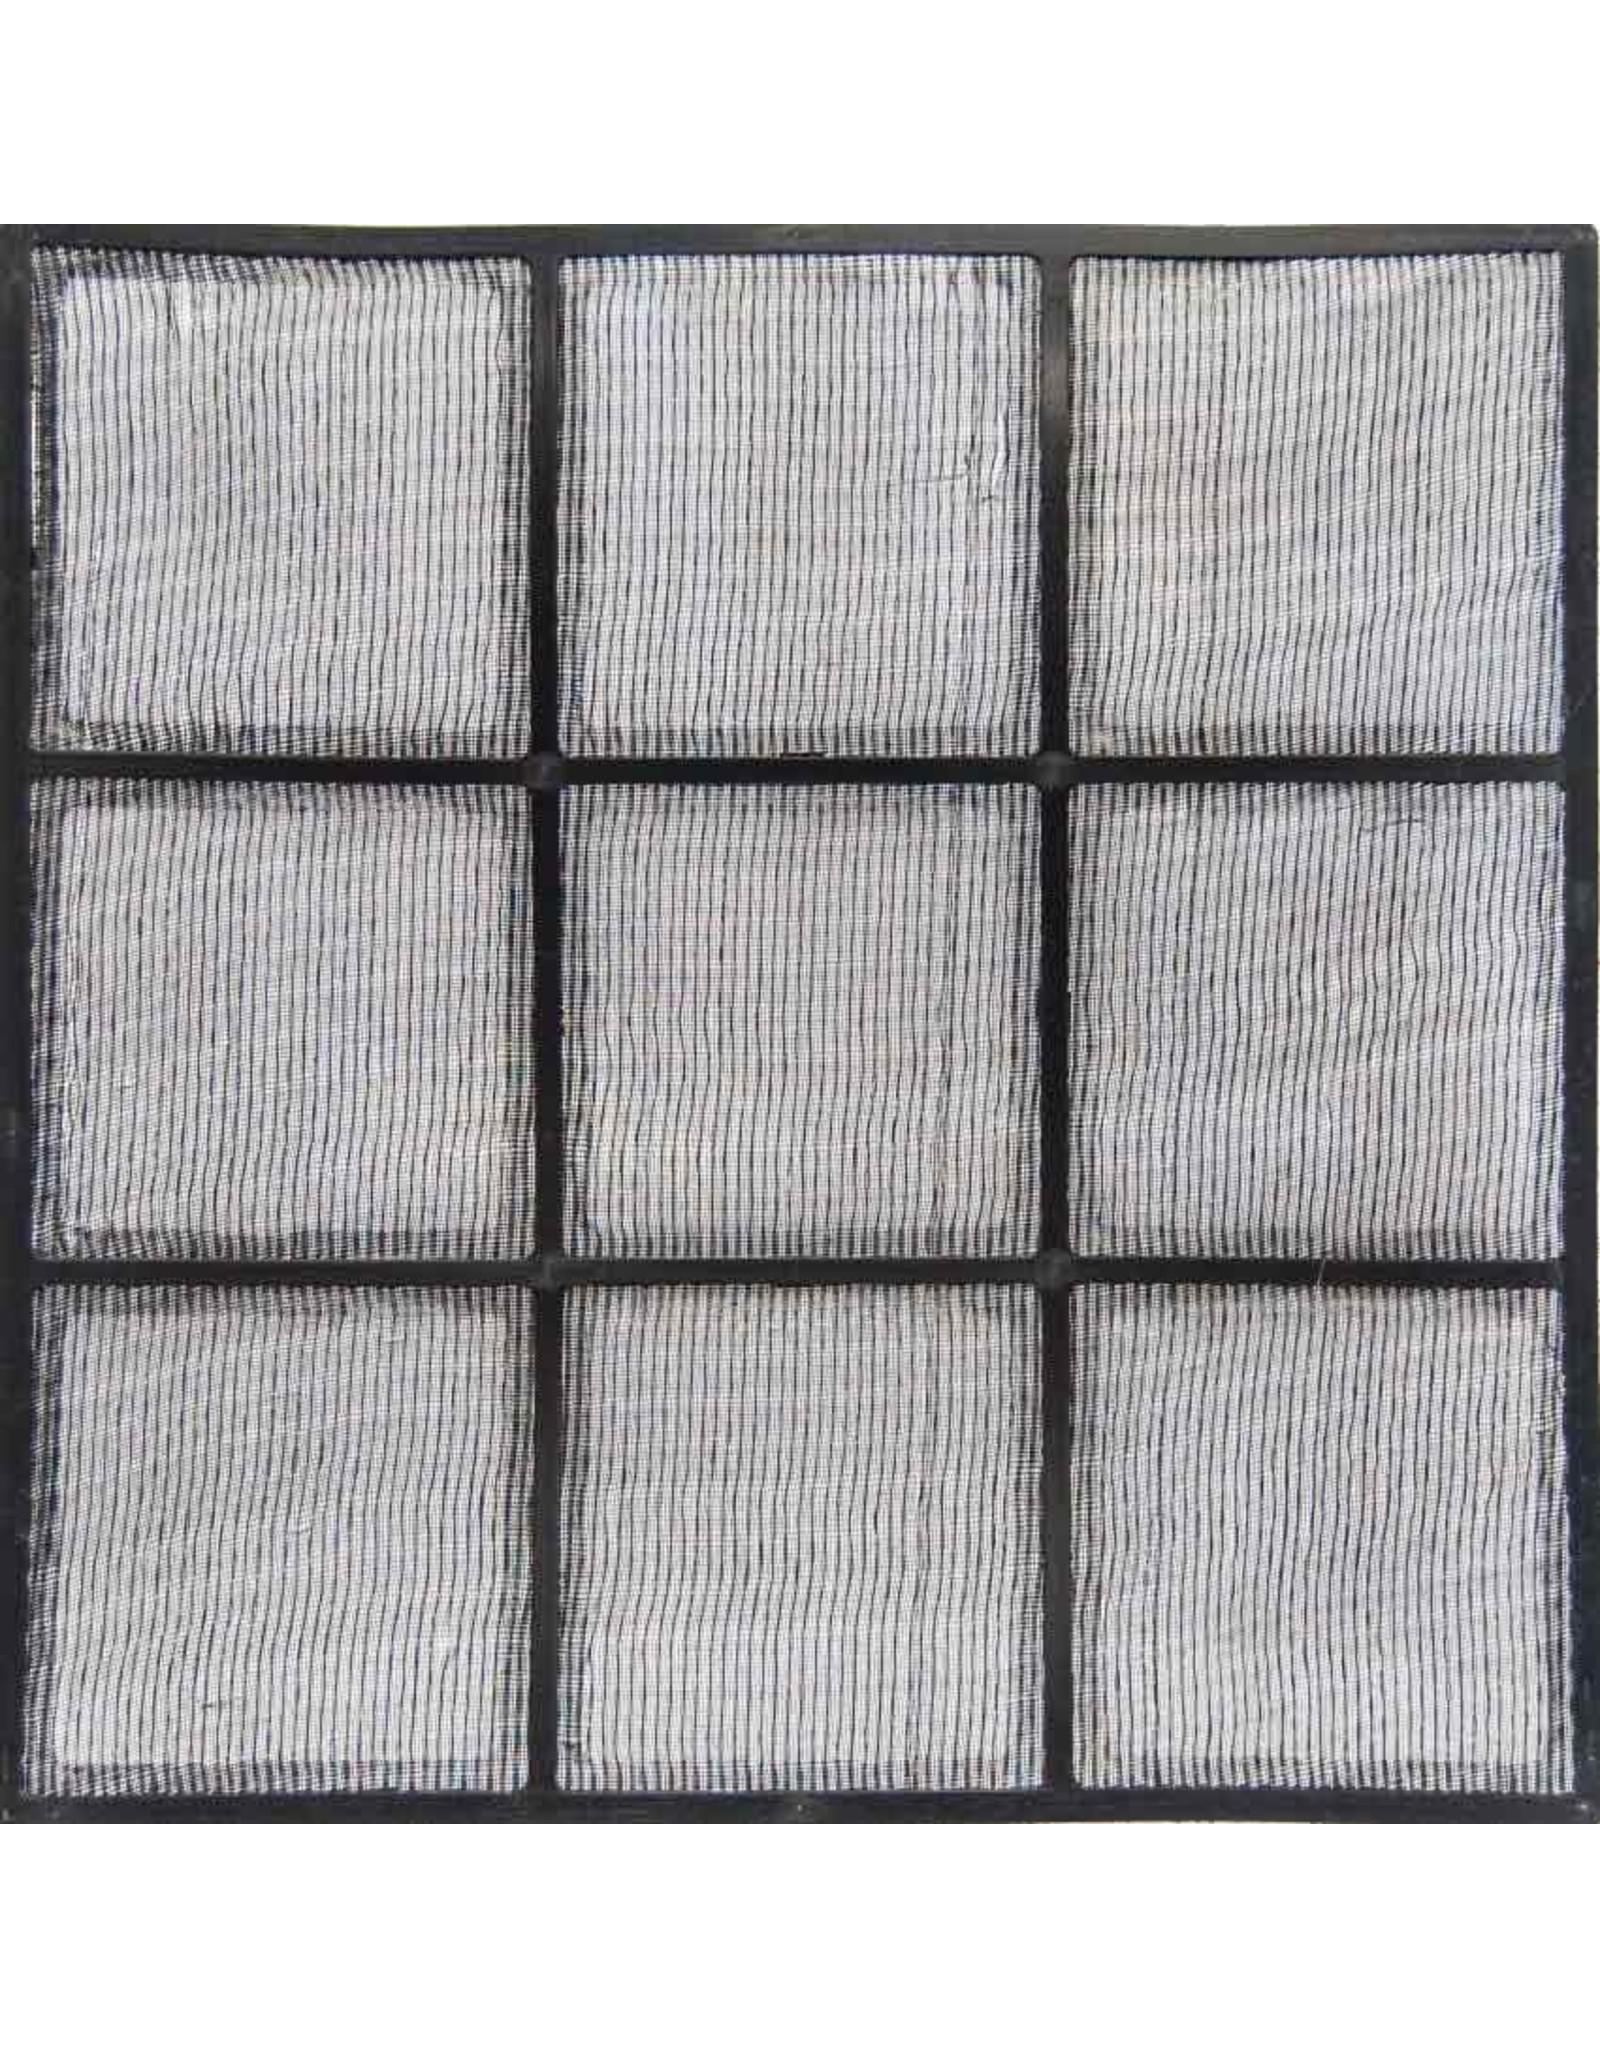 XPOWER Mini Air Scrubber NFS13 13″ x 13″ Washable Nylon Mesh Filter